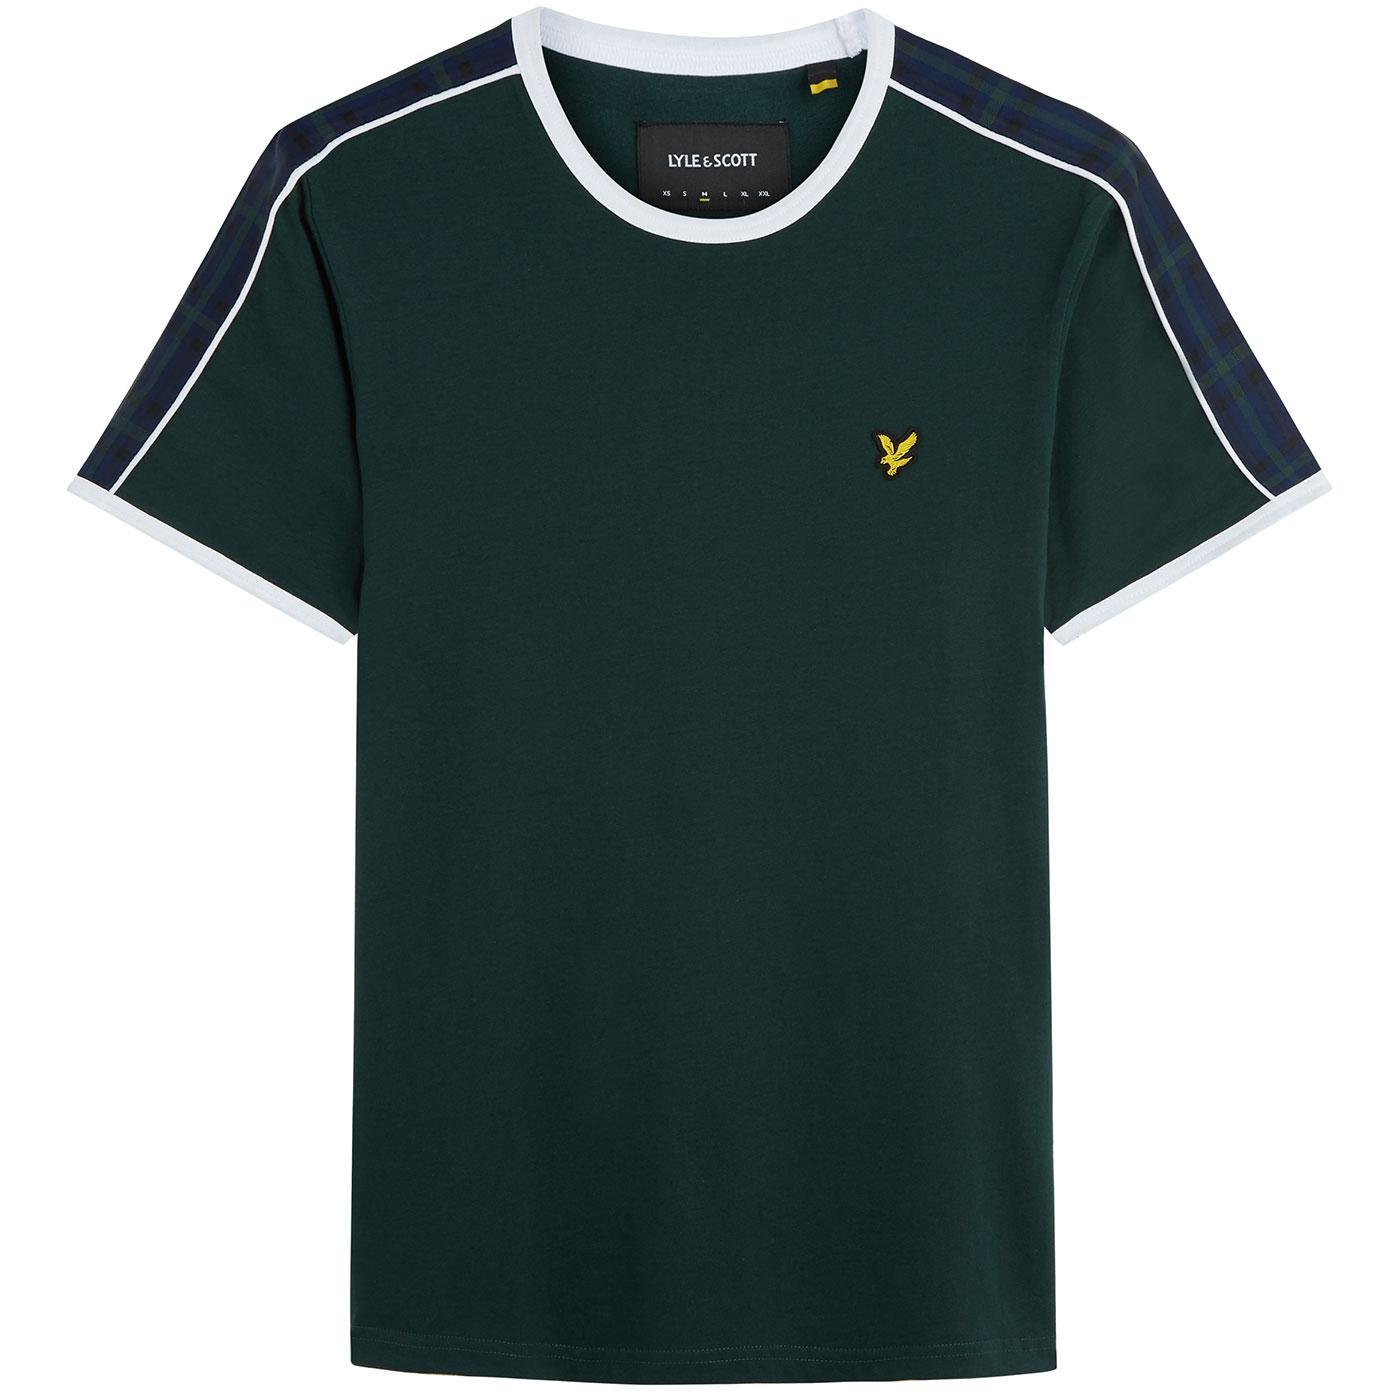 LYLE & SCOTT Retro Taped Sleeve Ringer T-Shirt